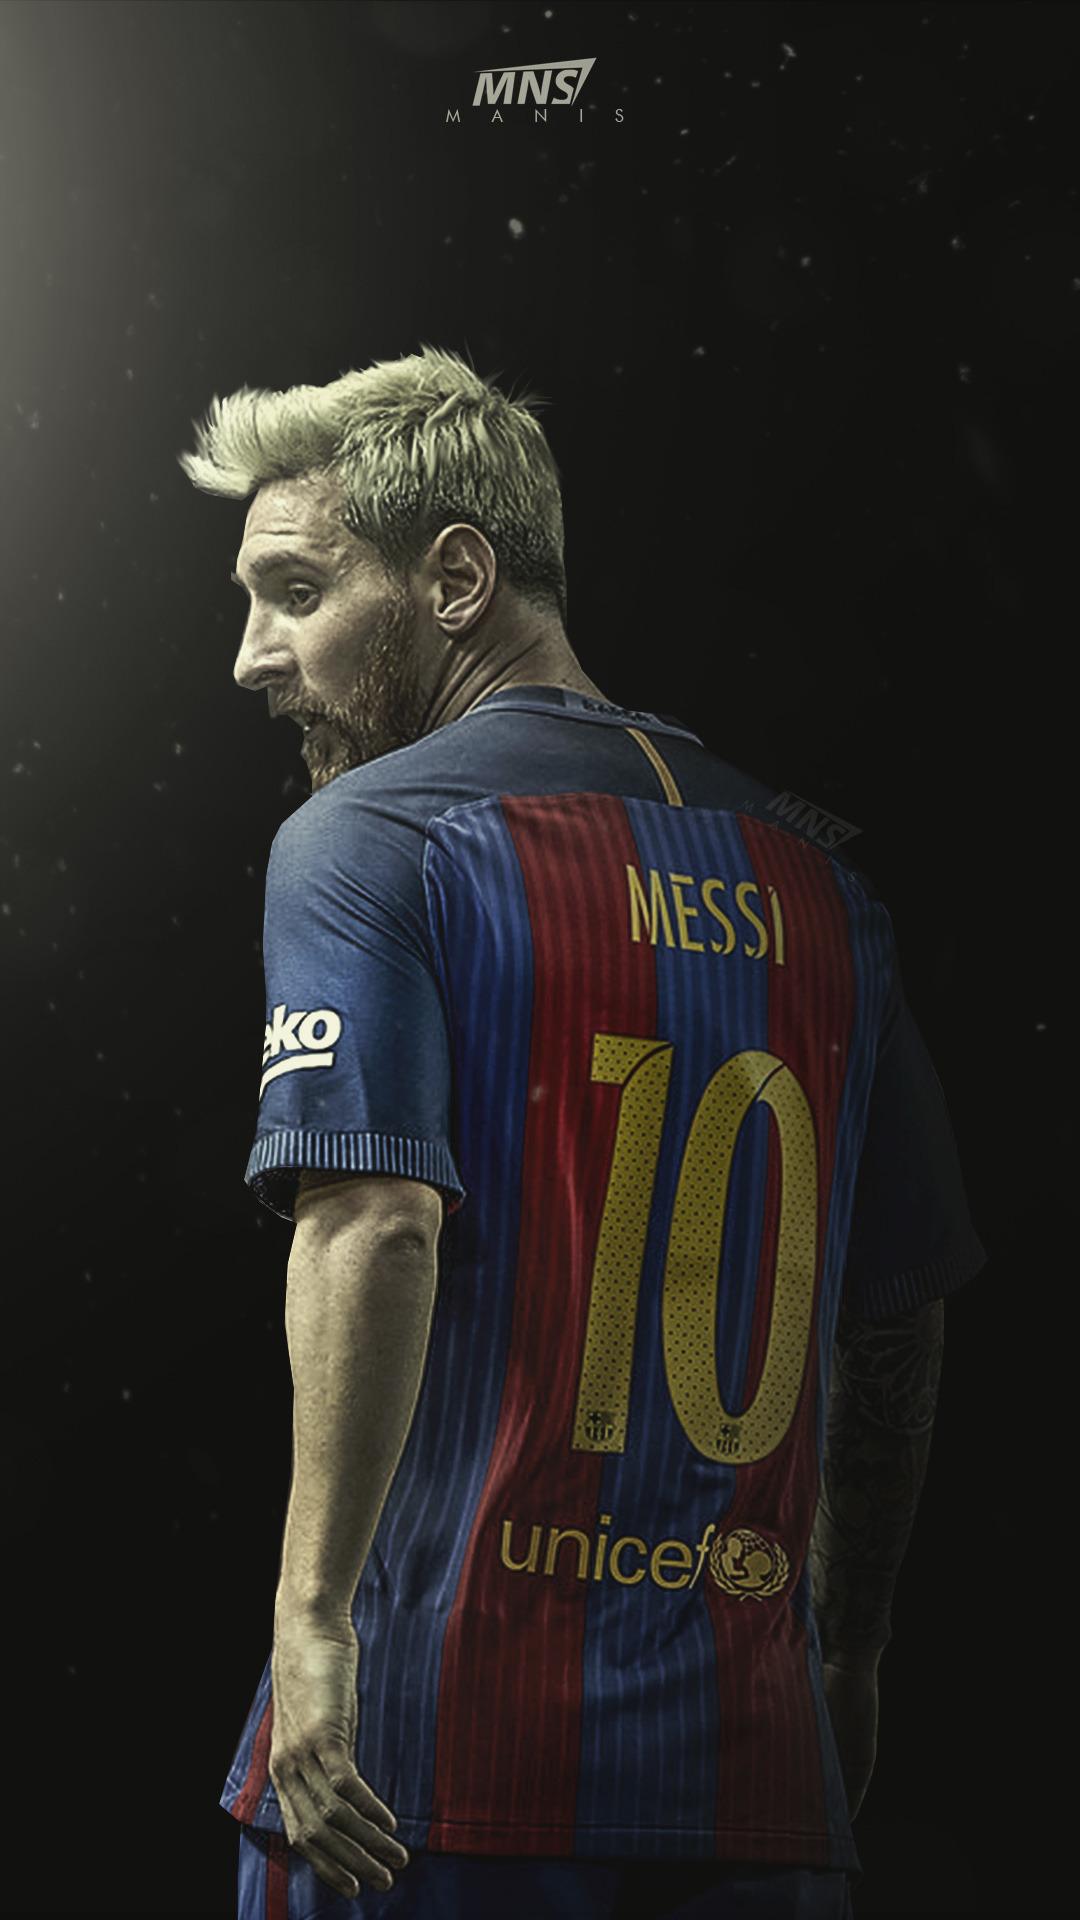 Fondos de pantalla fc barcelona fondos de pantalla for Fondos de pantalla de futbol para celular